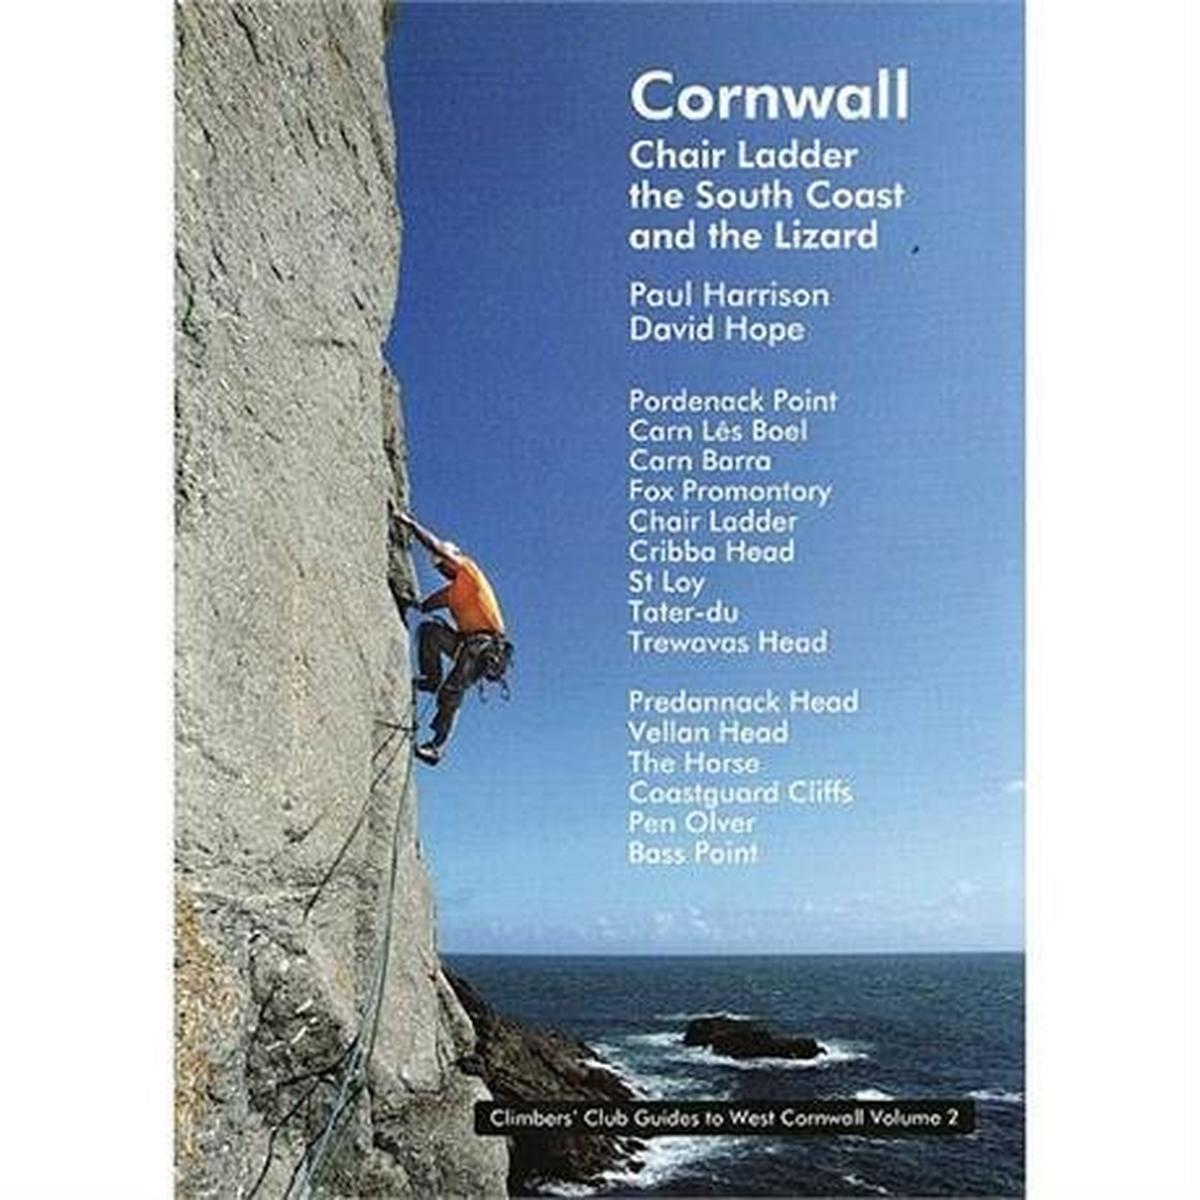 Miscellaneous Climbers Club Climbing Guide Book: Cornwall - Chair Ladder & The Lizard